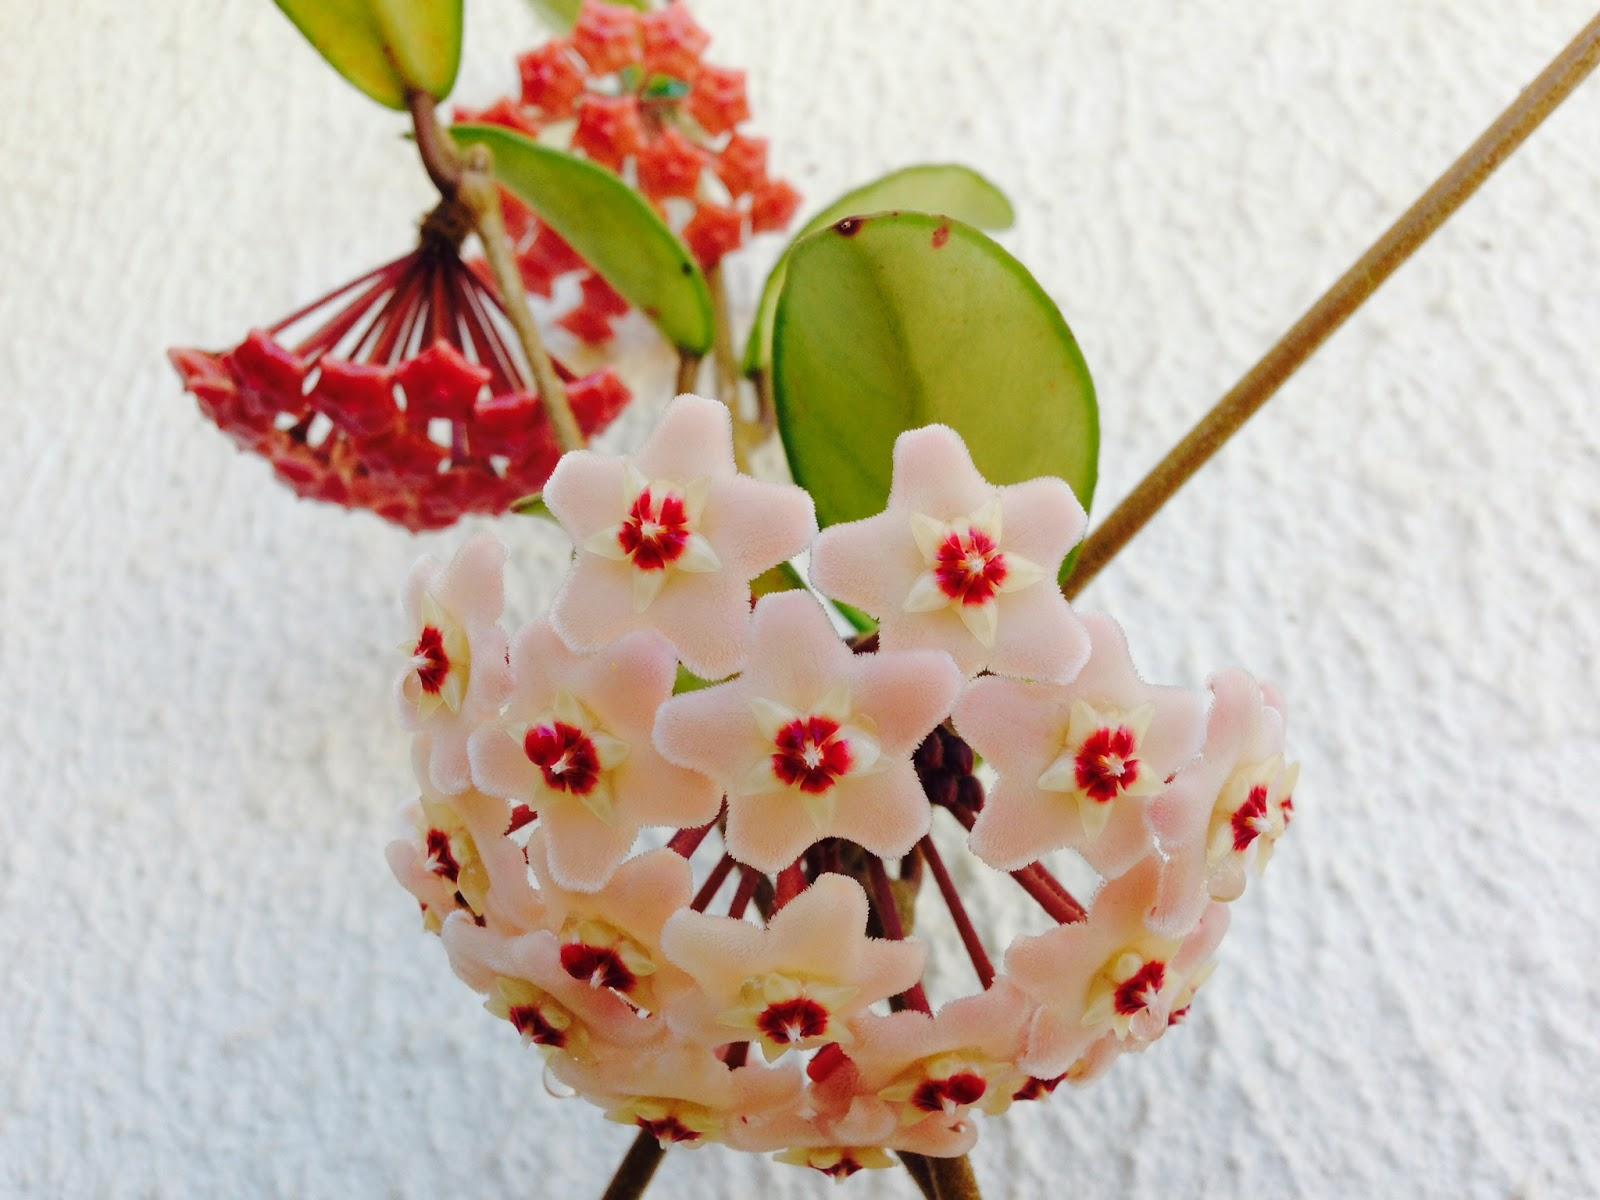 Hoya carnosa - Flor-de-cera